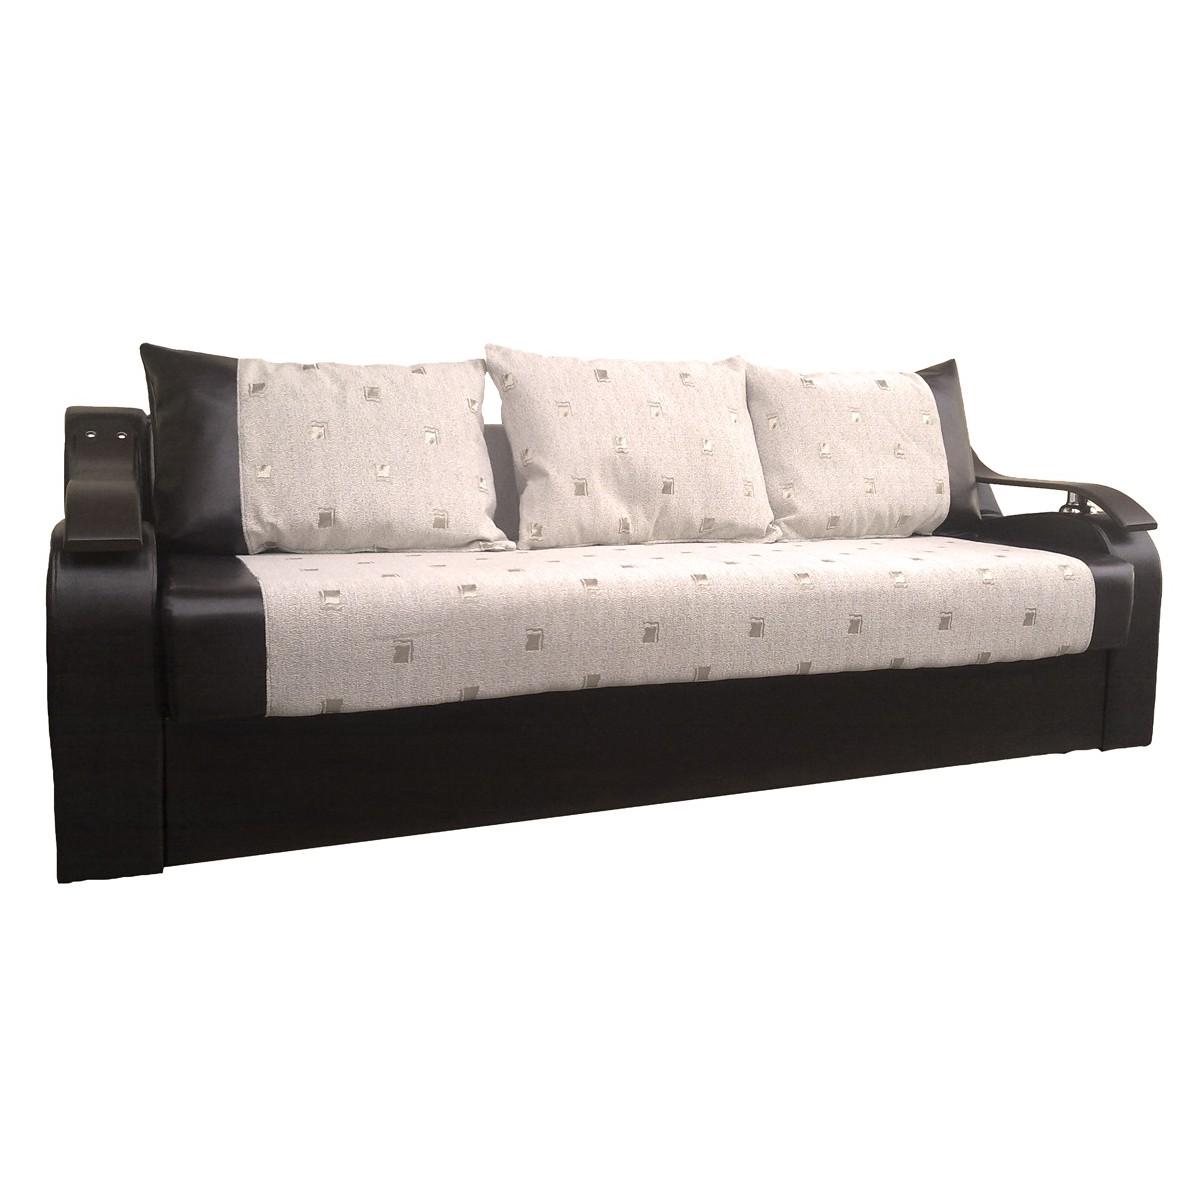 Dedeman canapea extensibila 3 locuri sorana cu lada for Canapele dedeman